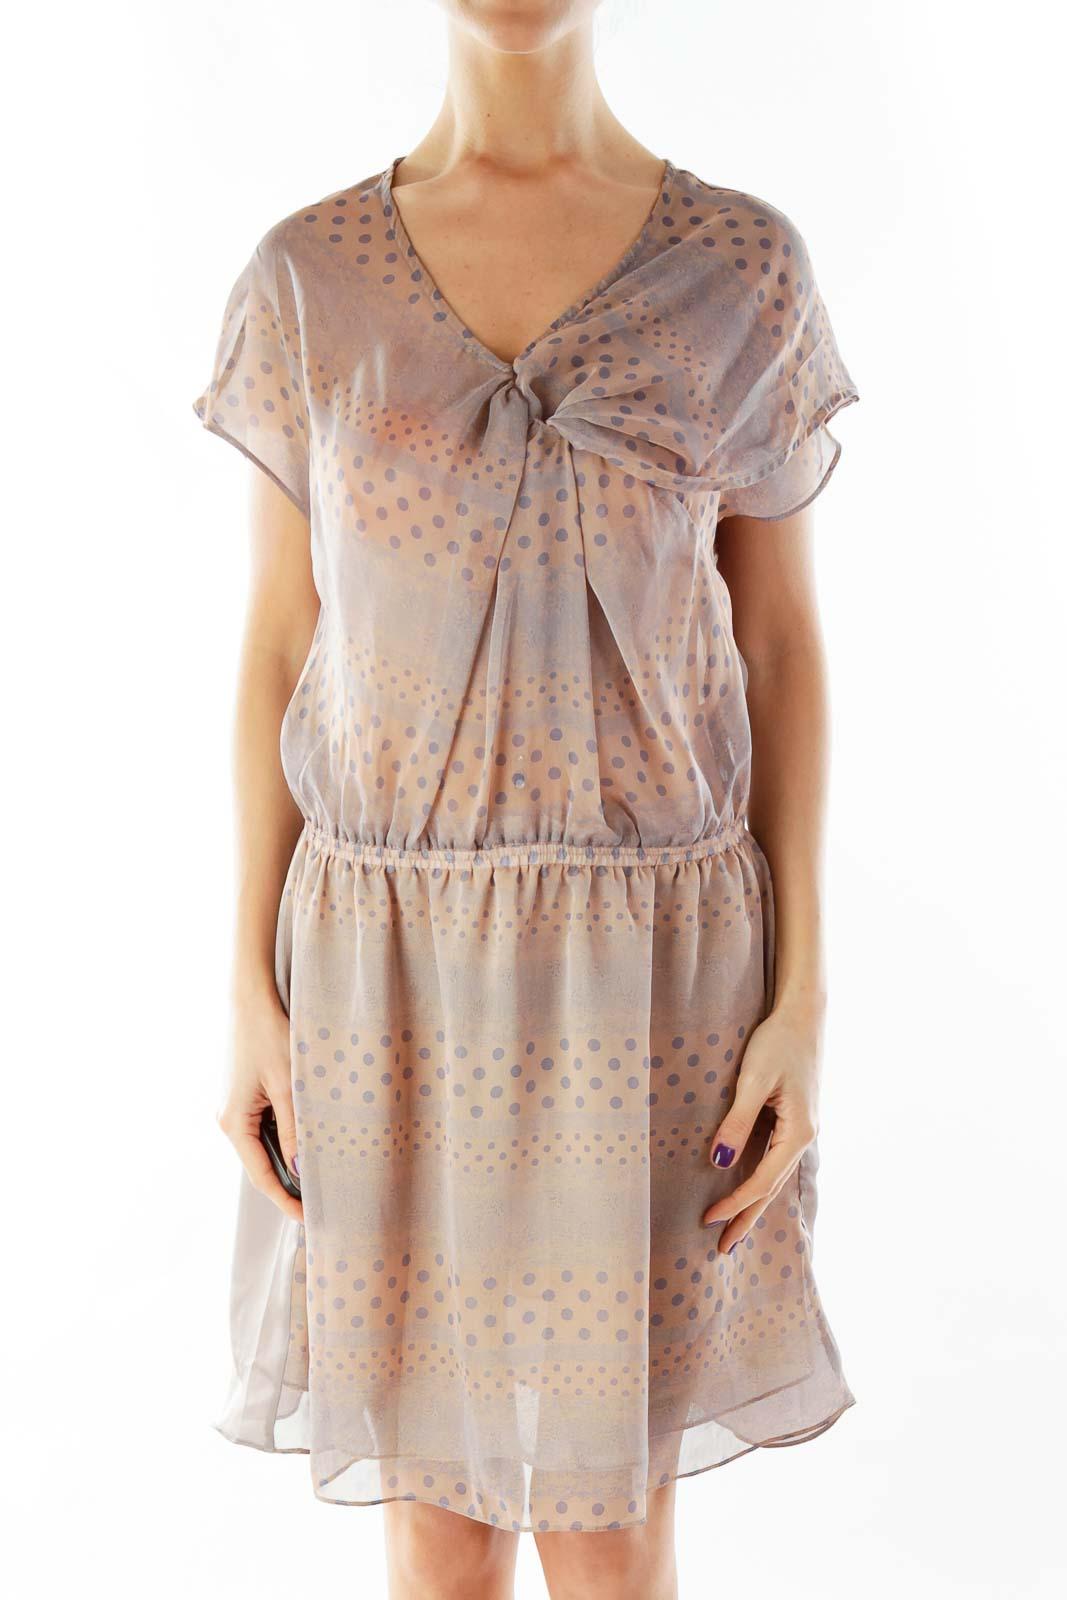 Purple Polka-Dot Day Dress